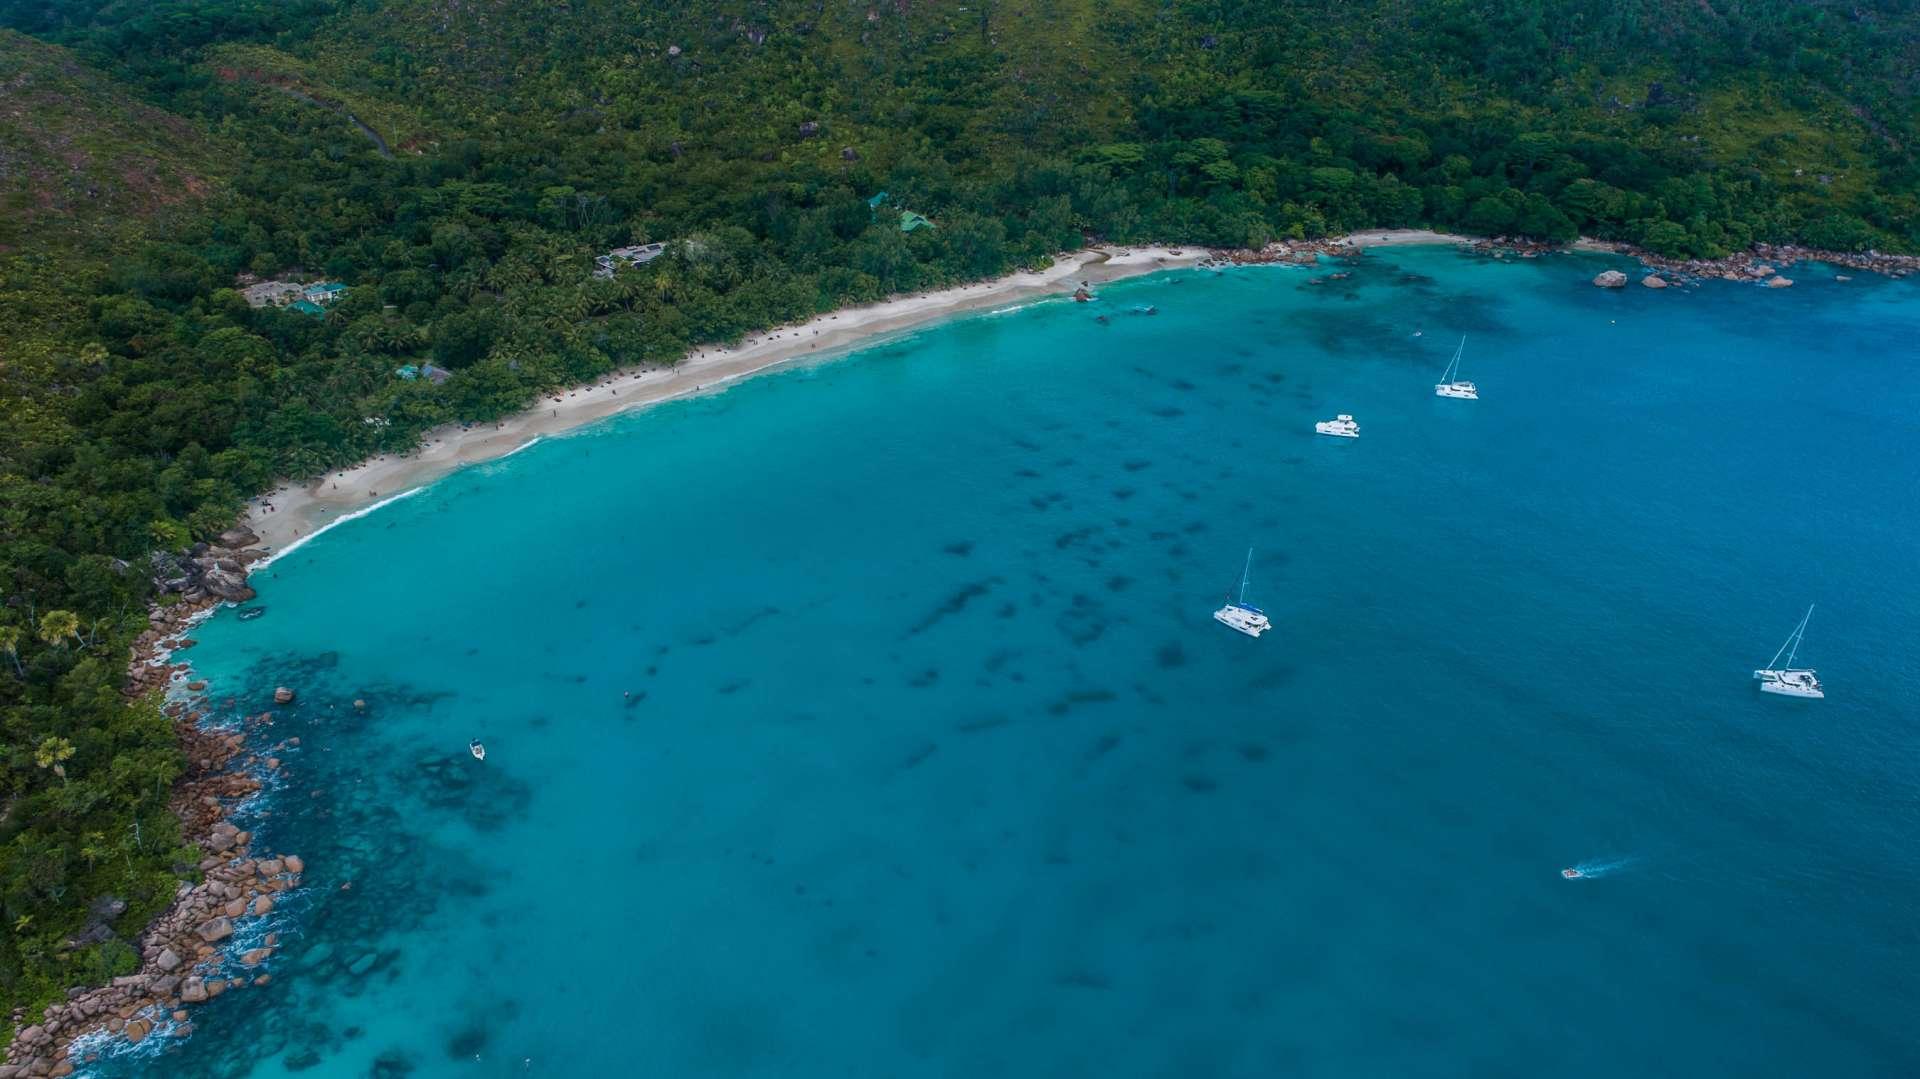 Seychelles Anse Lazio aerial view drone enrico pescantini from above 2